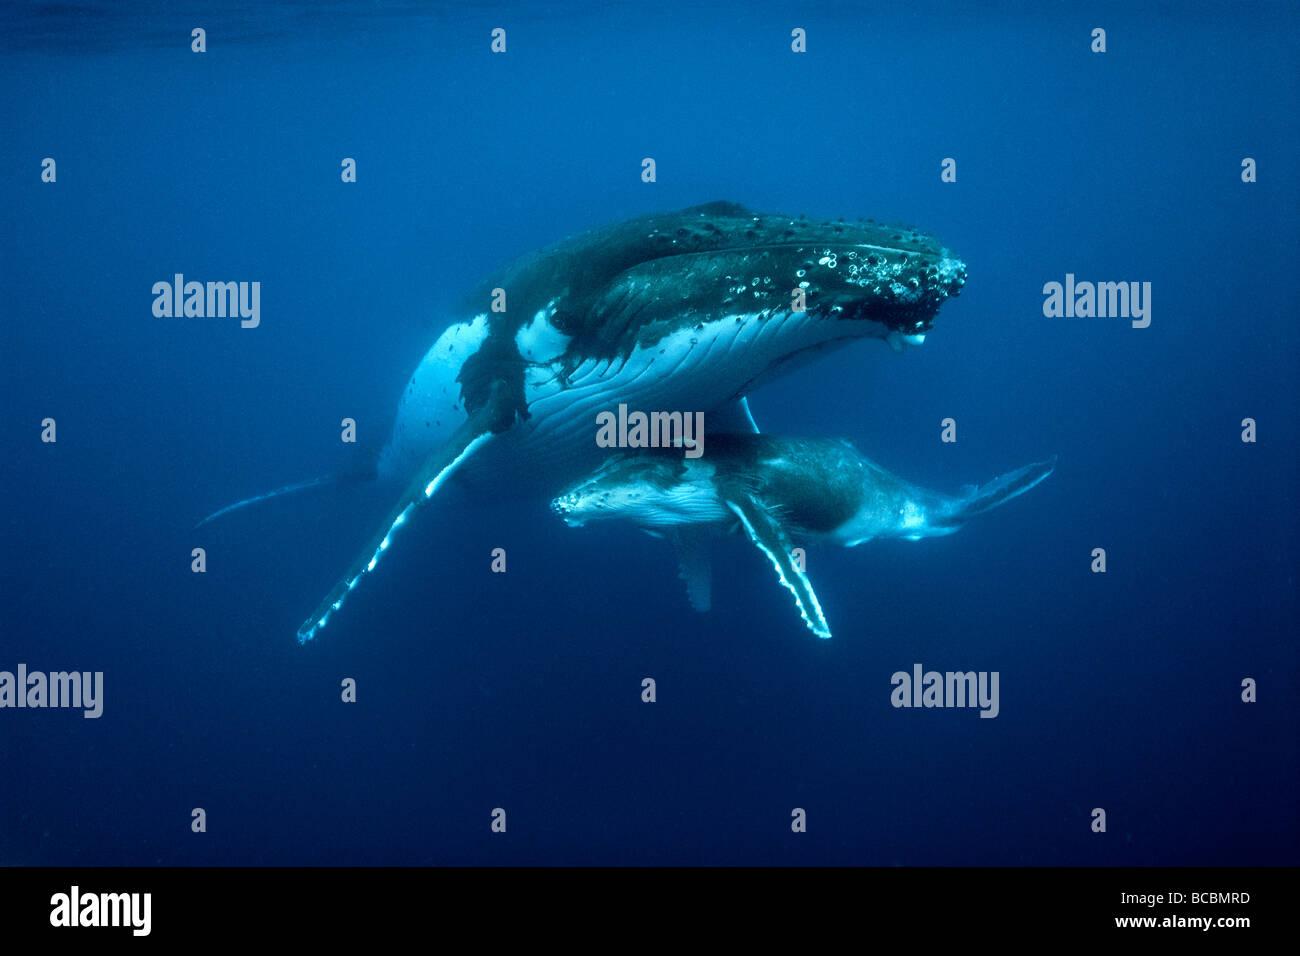 Balene megattere Immagini Stock